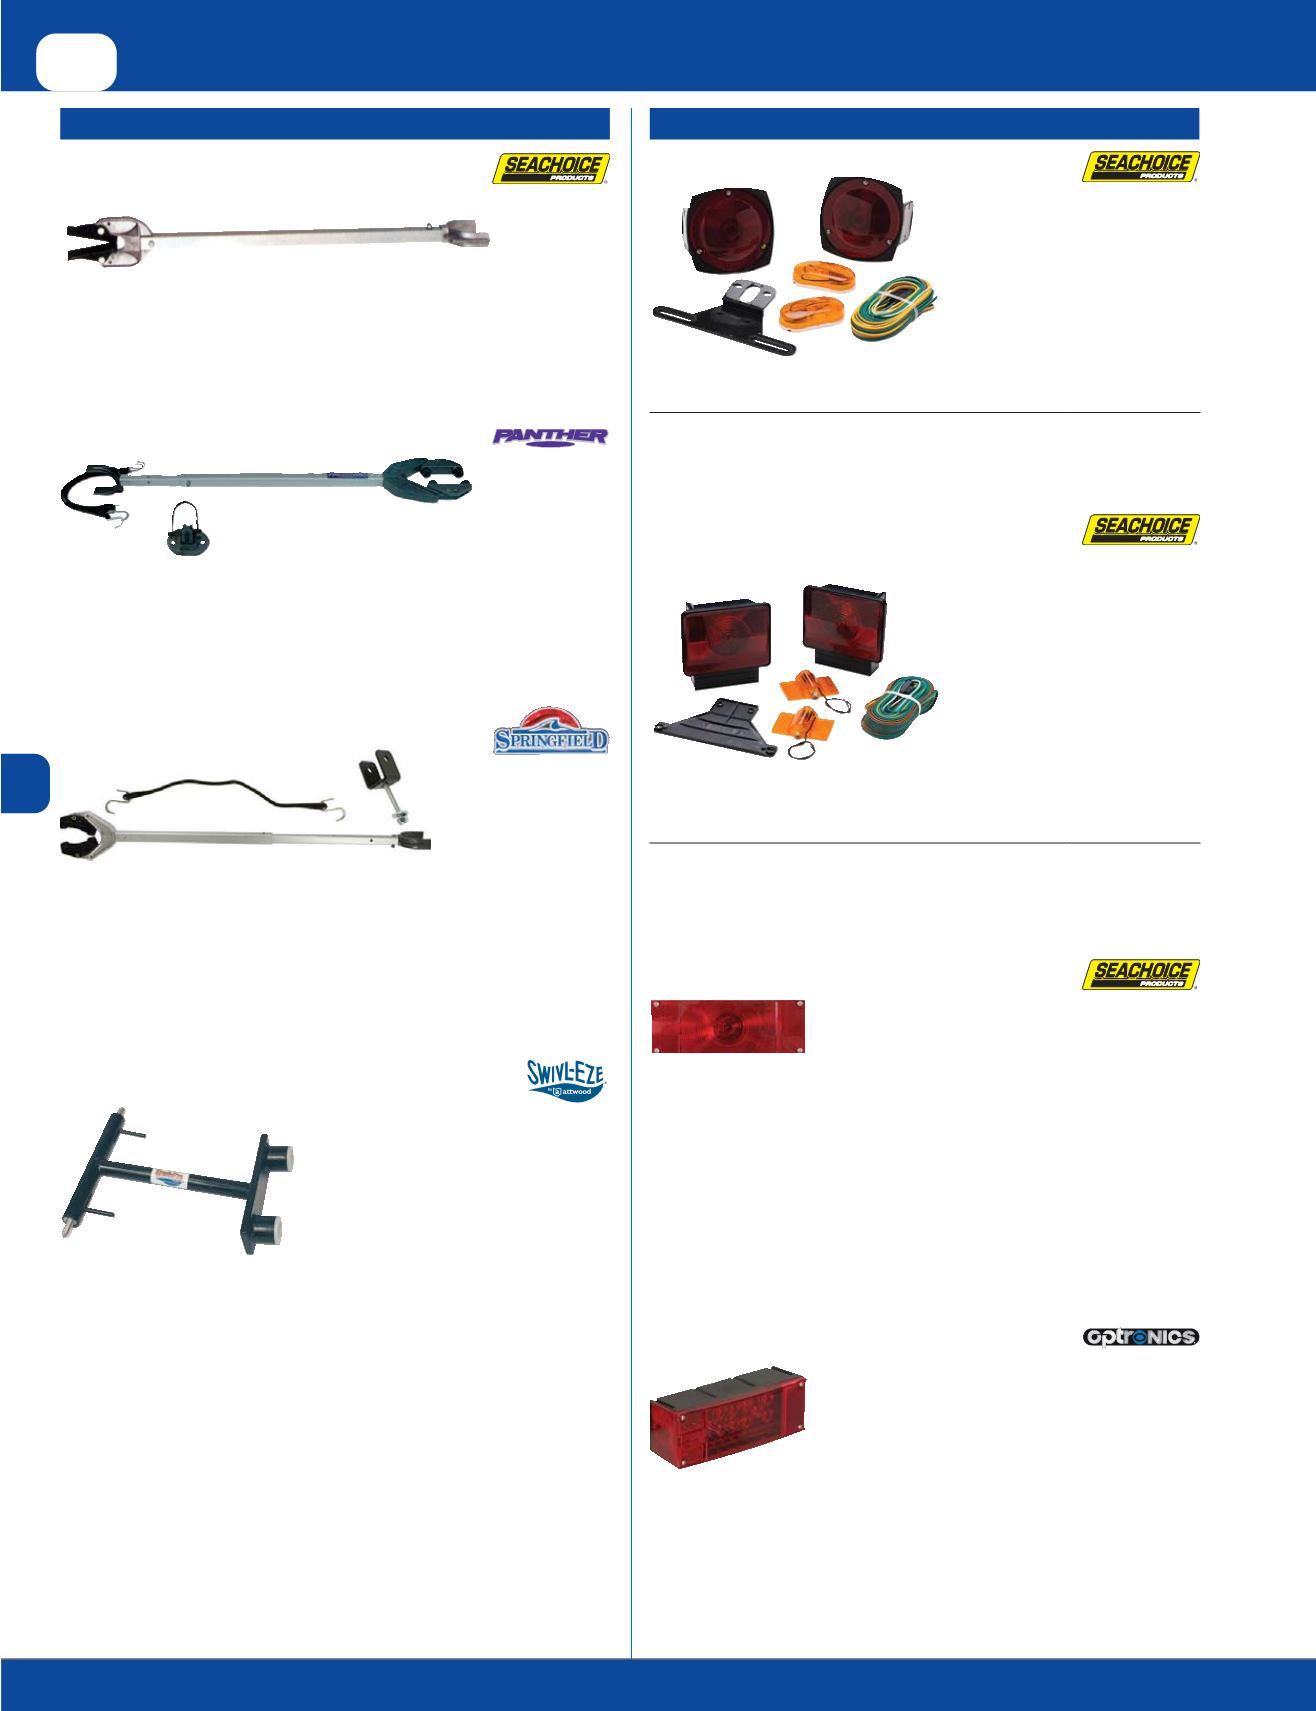 USA Seachoice 50-28001 Salva transom ajustable